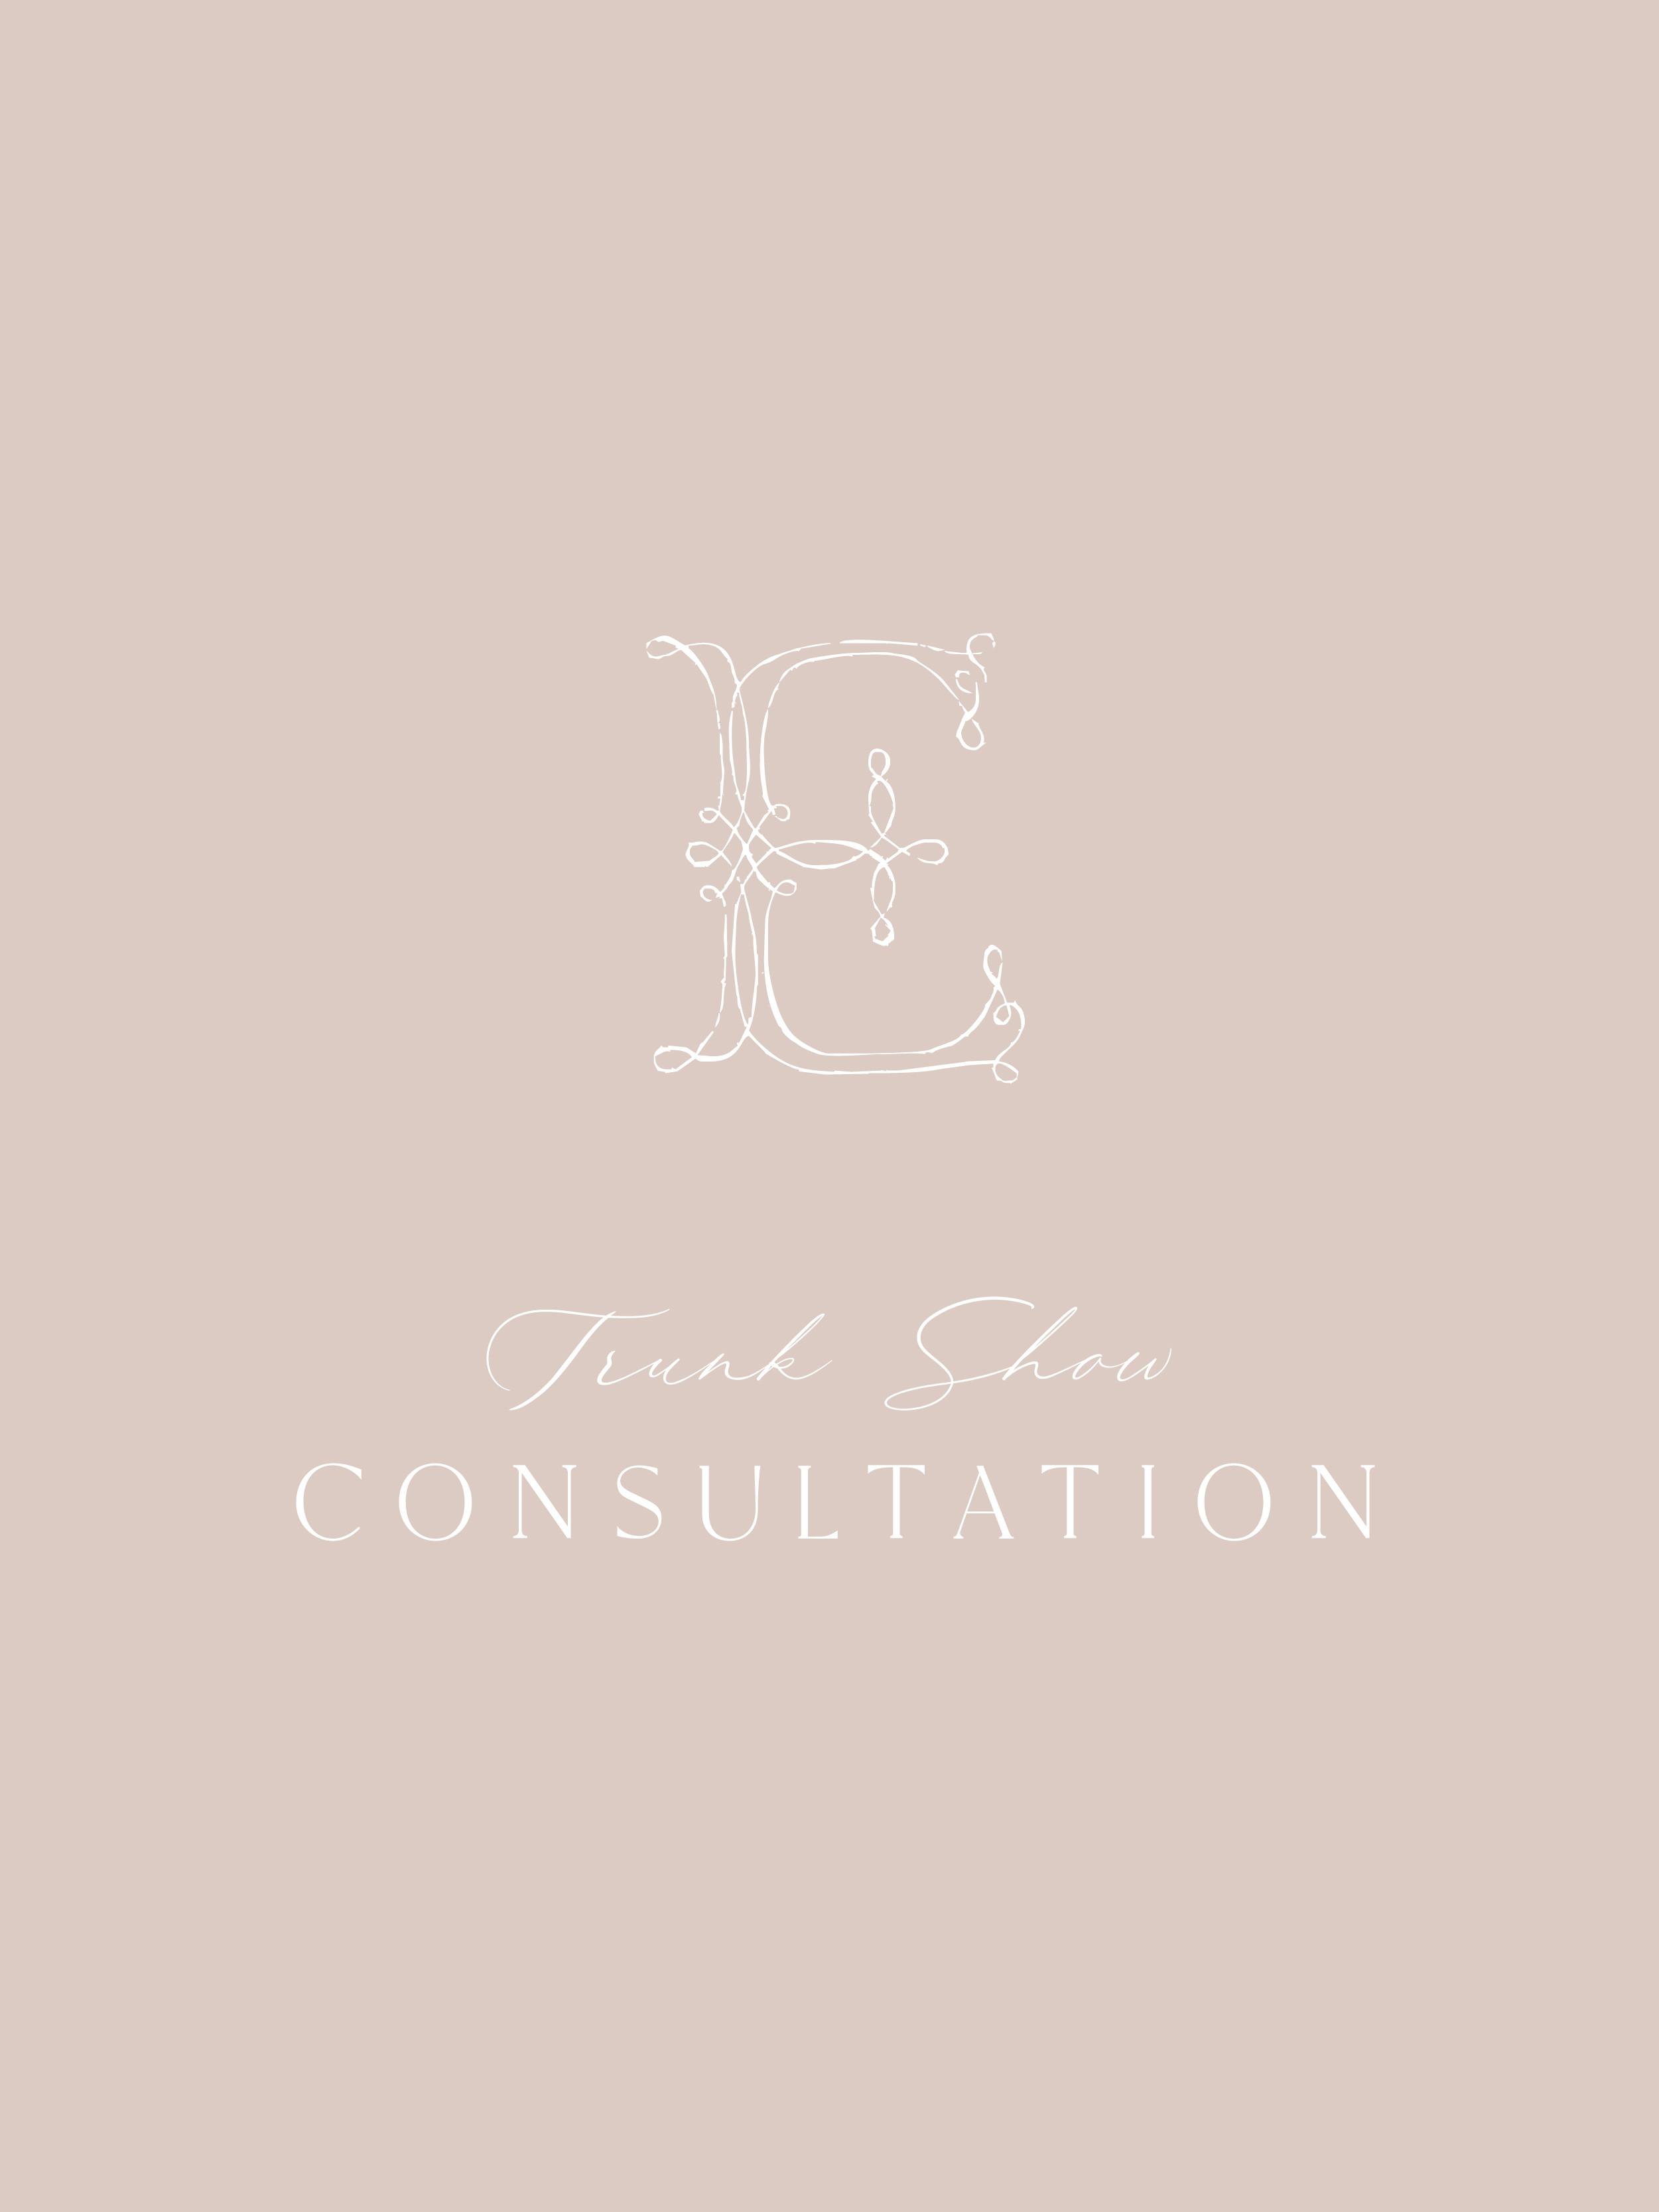 Trunk Show Consultation